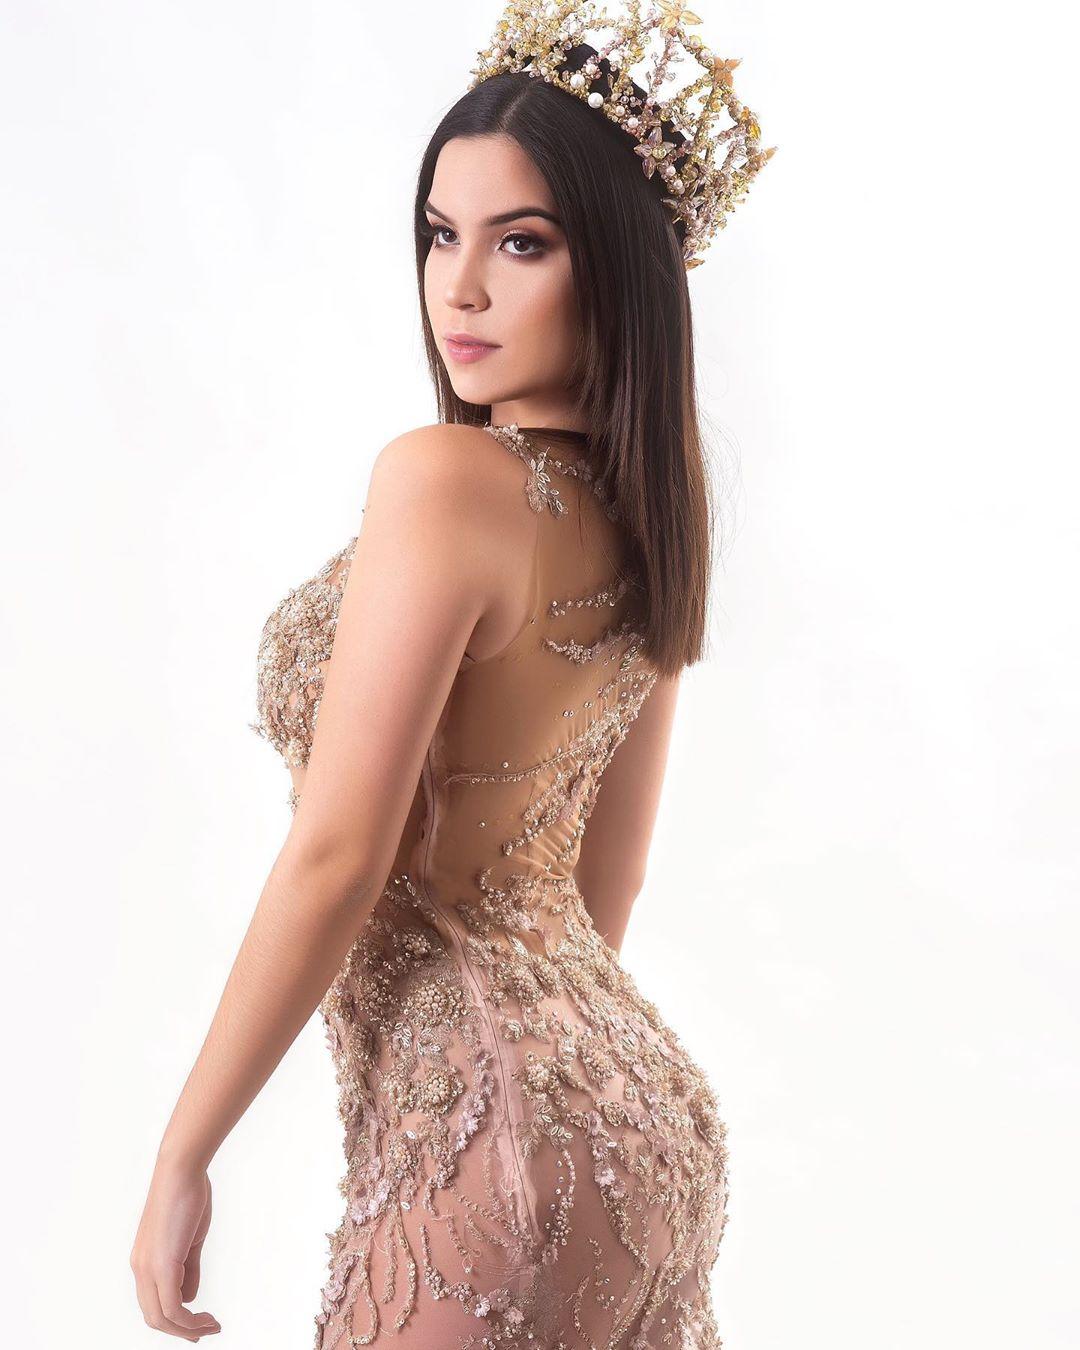 micaela leon mandriotti, miss peru latinoamerica 2019. 69155210